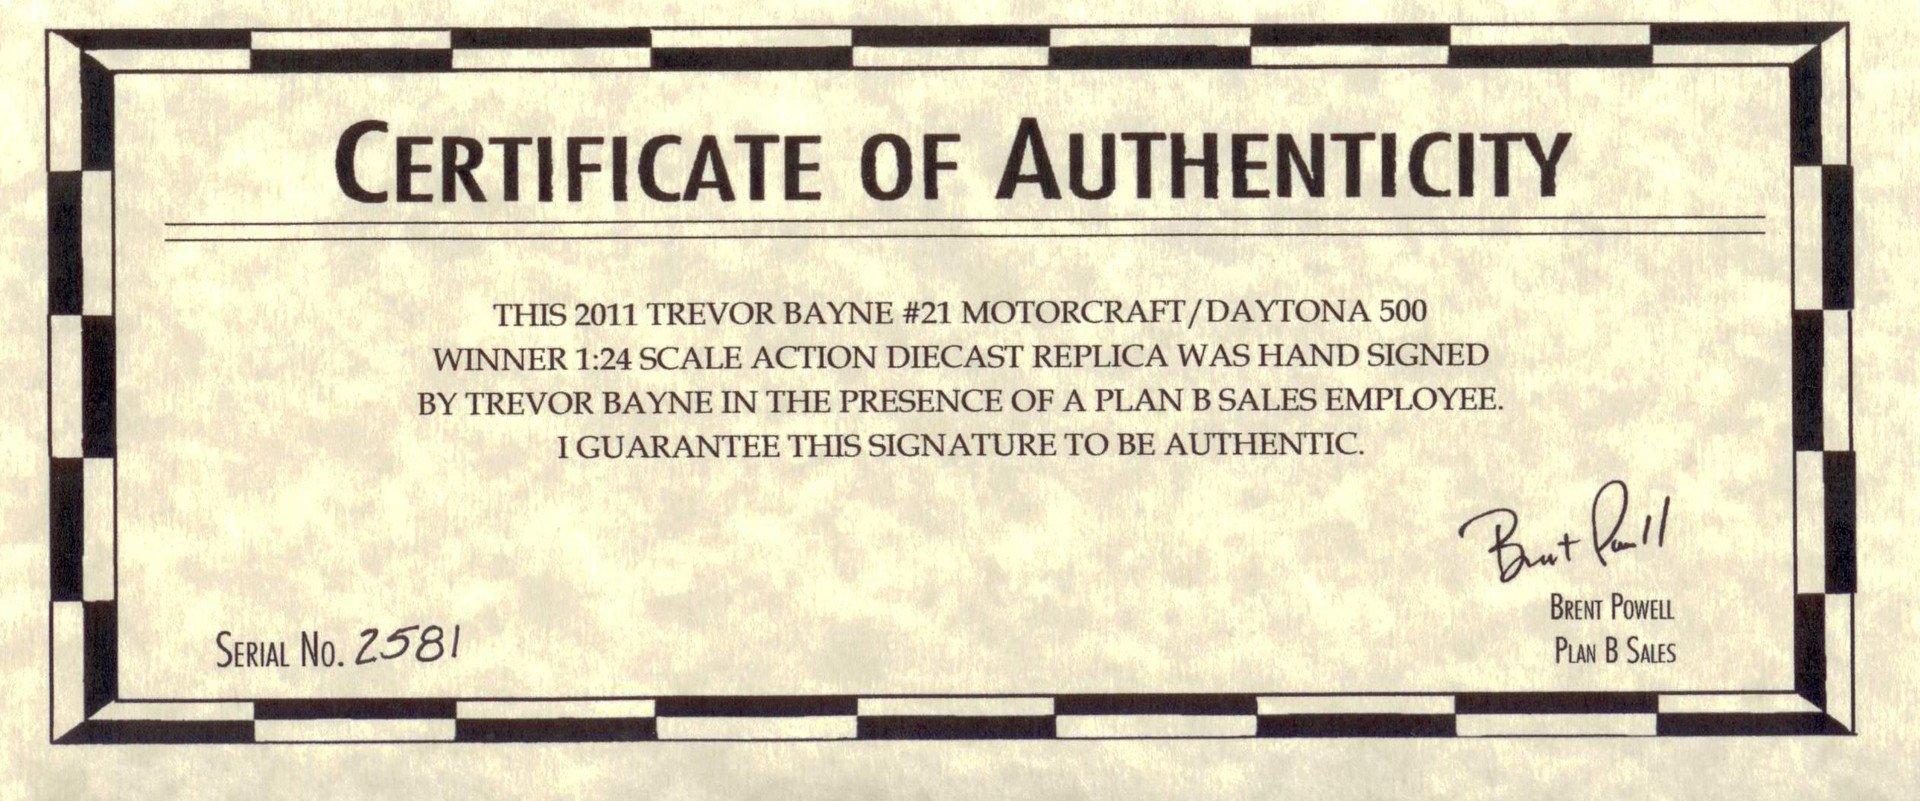 Certificate Of Authenticity Autograph Template Autograph Education